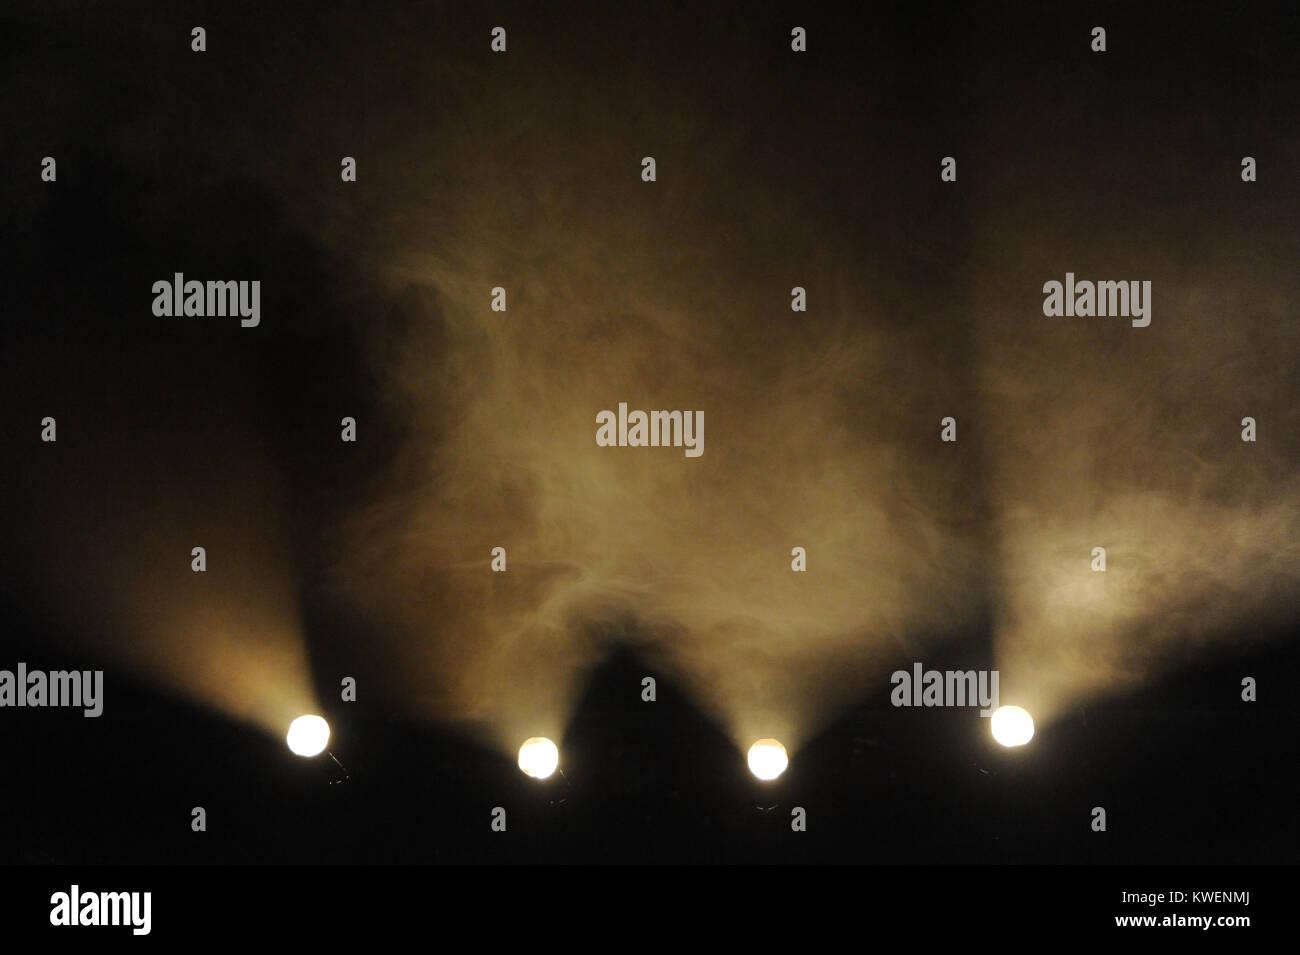 Sage Lighting - Stock Image